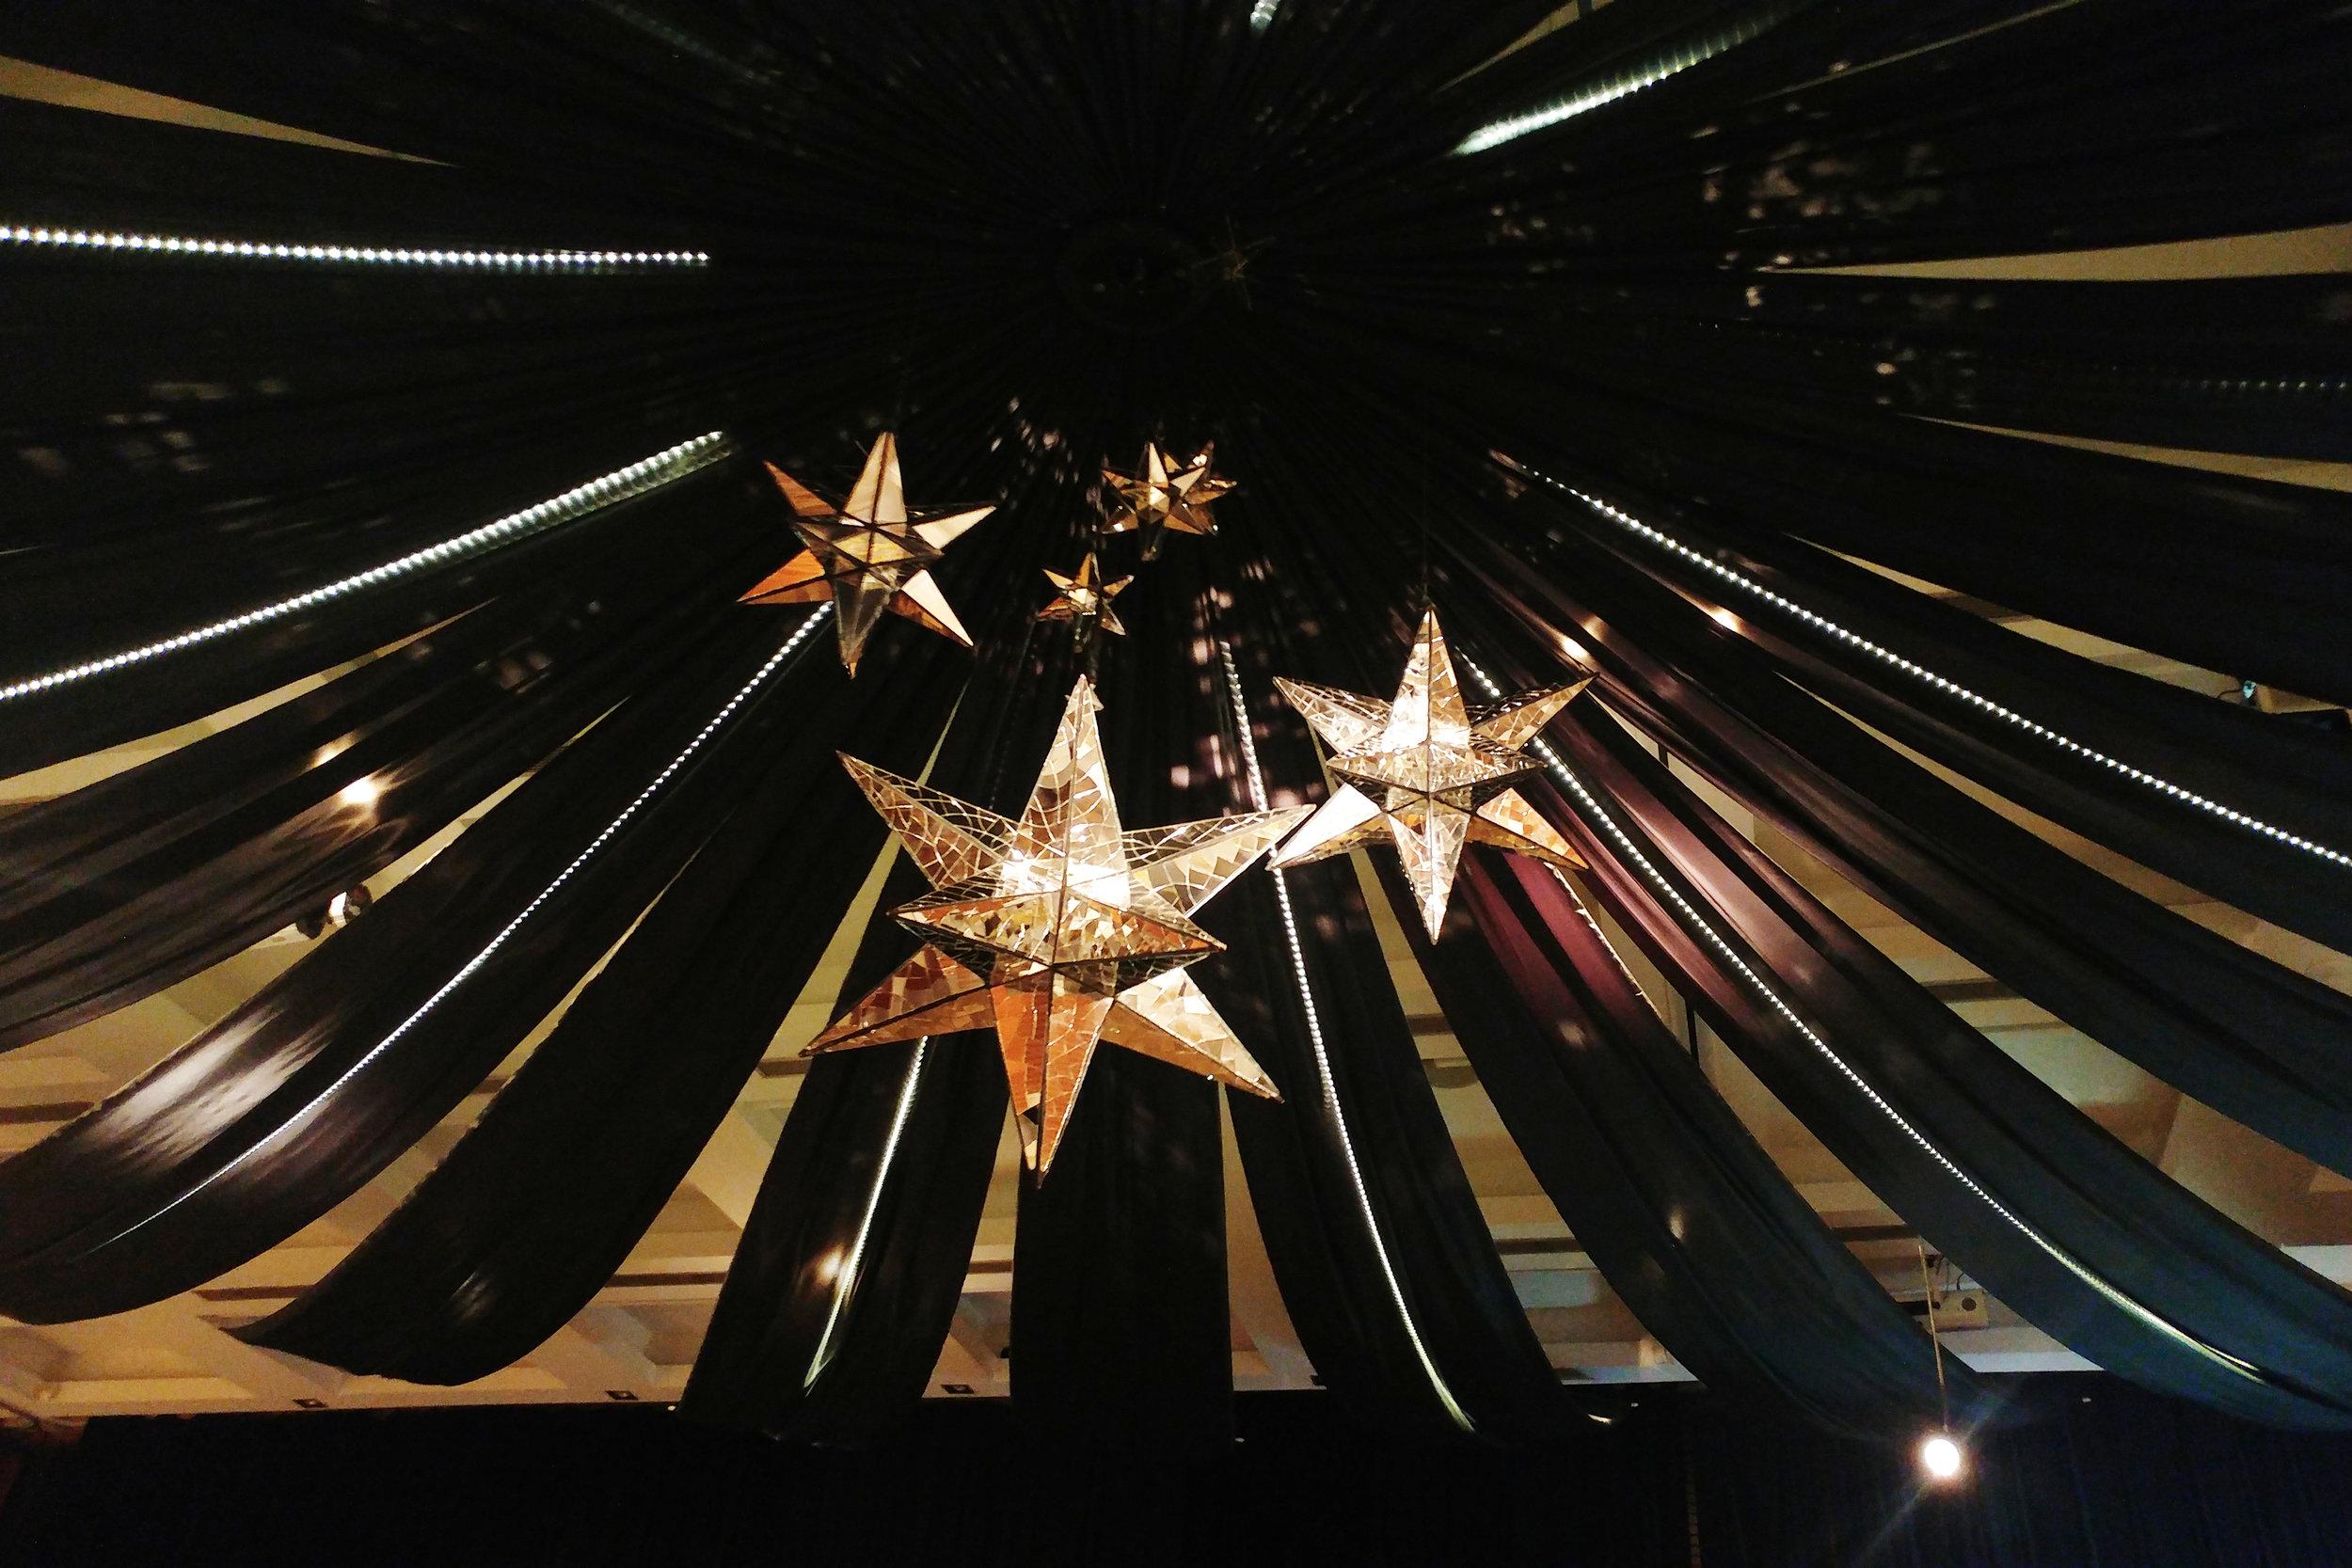 black ceiling & mirrored stars.jpg